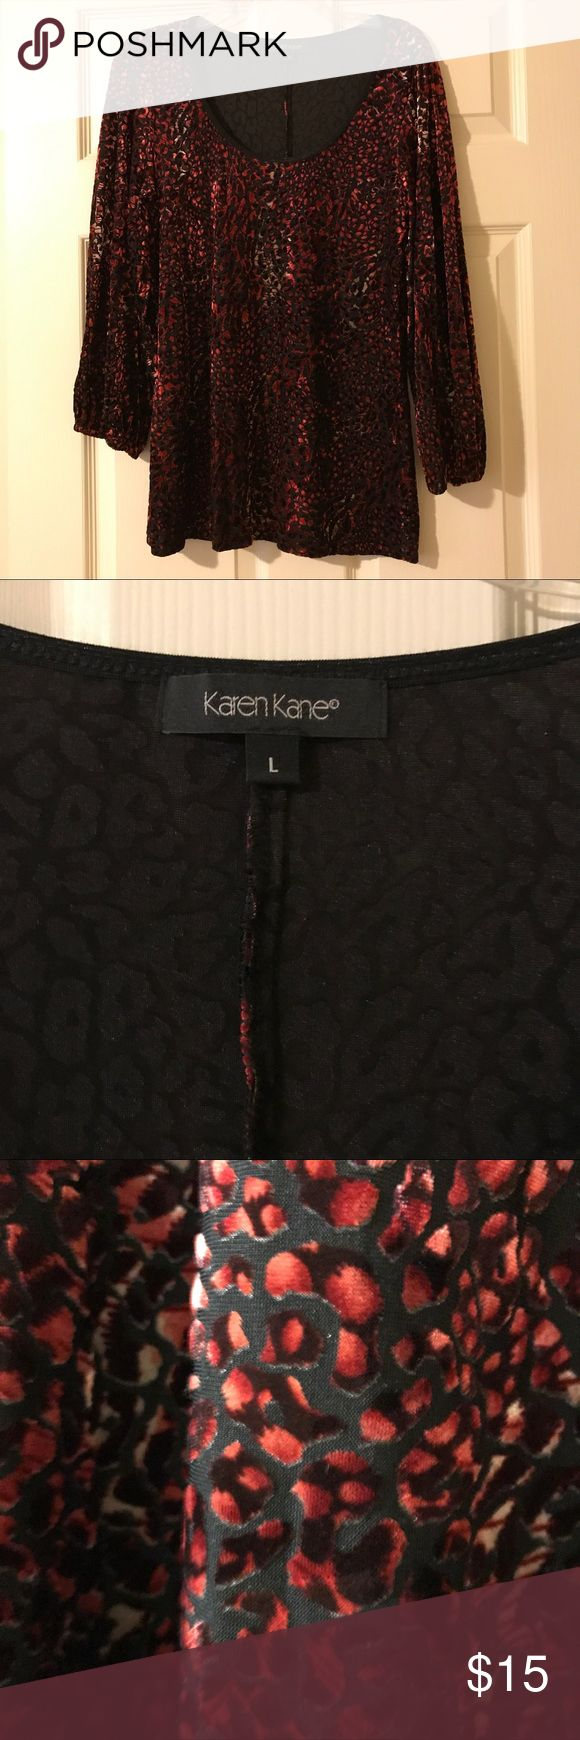 Beautiful Karen Kane tunic Soft velvet like material in red and black.  Sleeves are long with elastic at wrist. Karen Kane Tops Tunics